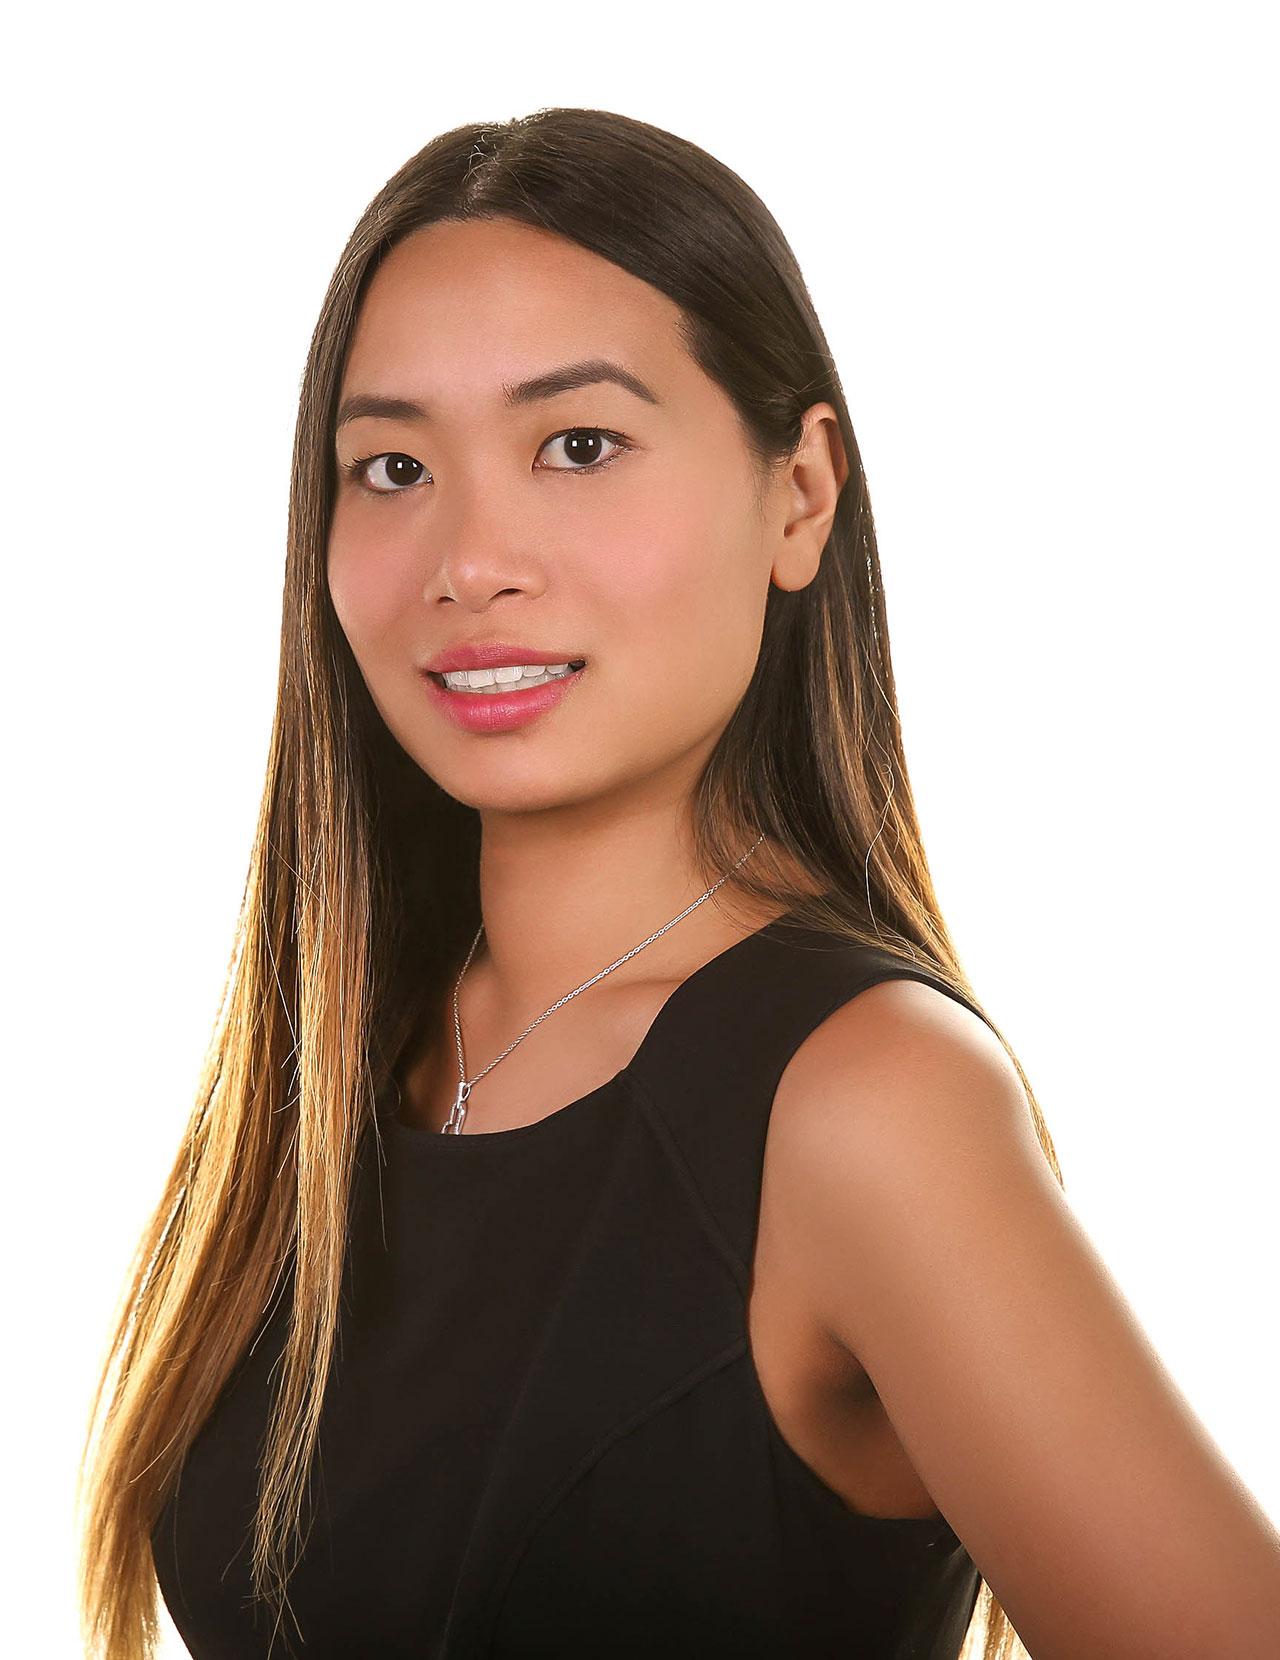 Victoria Chung